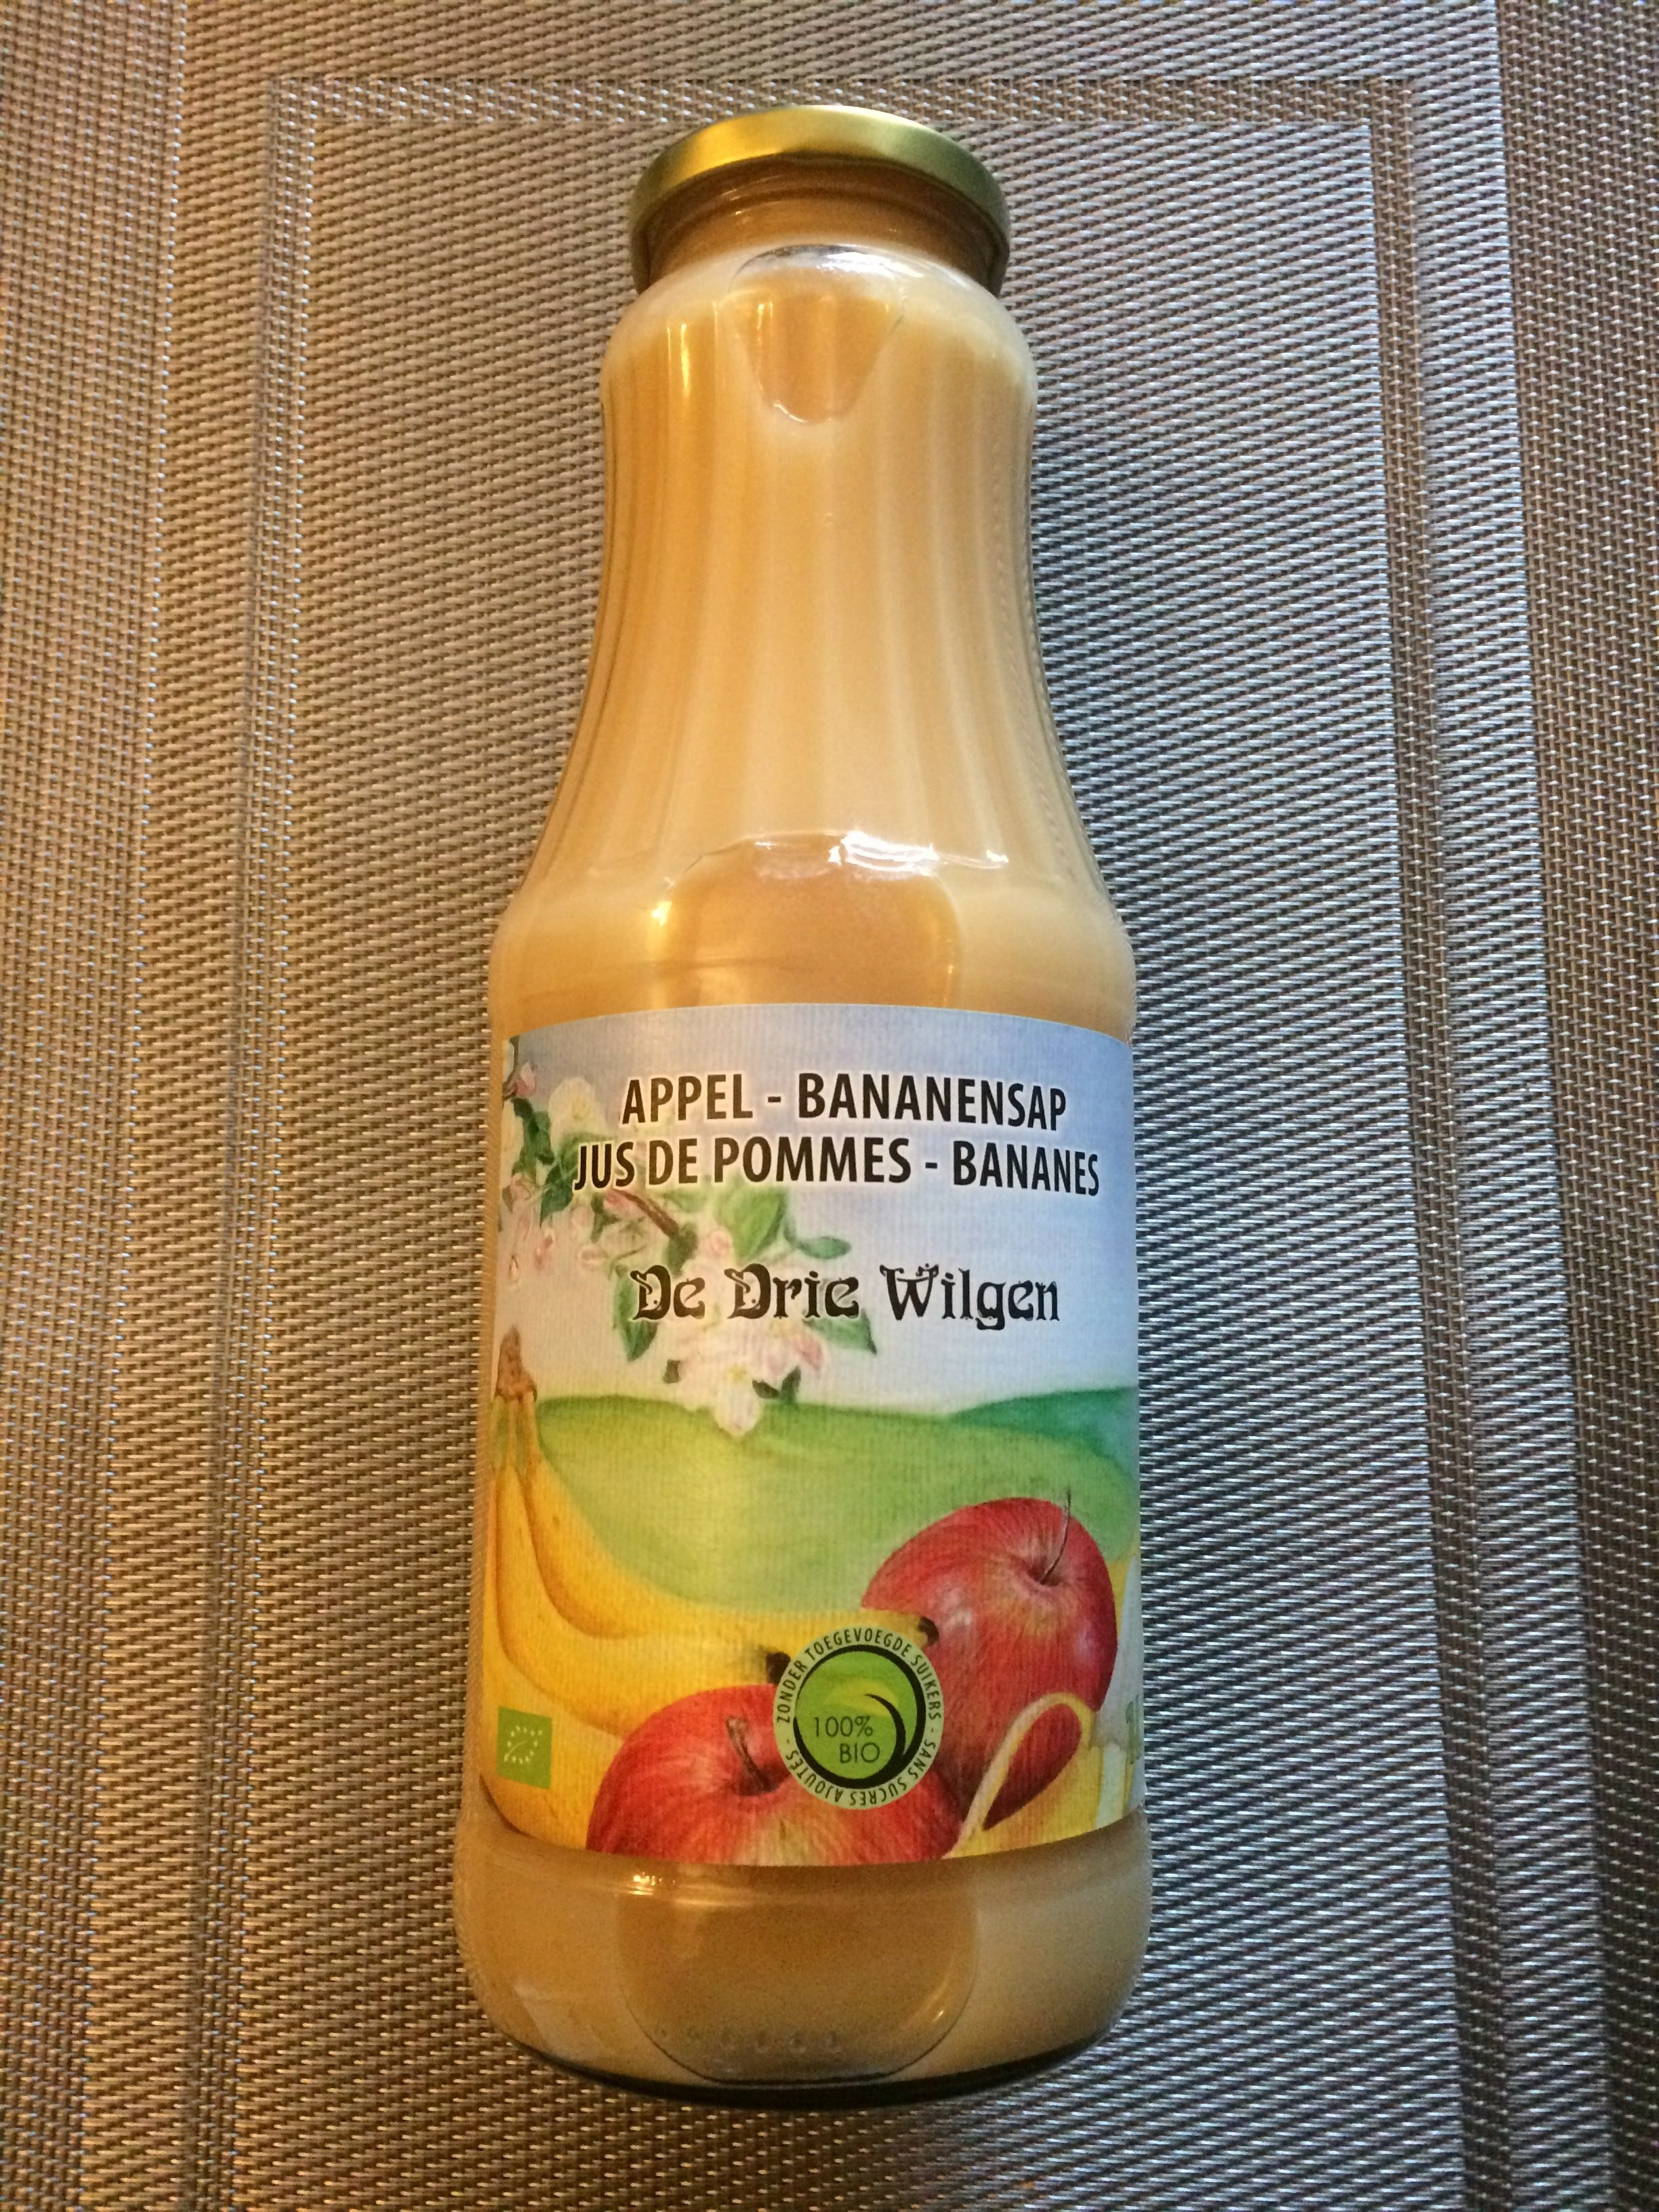 Jus de pommes - bananes - Product - fr